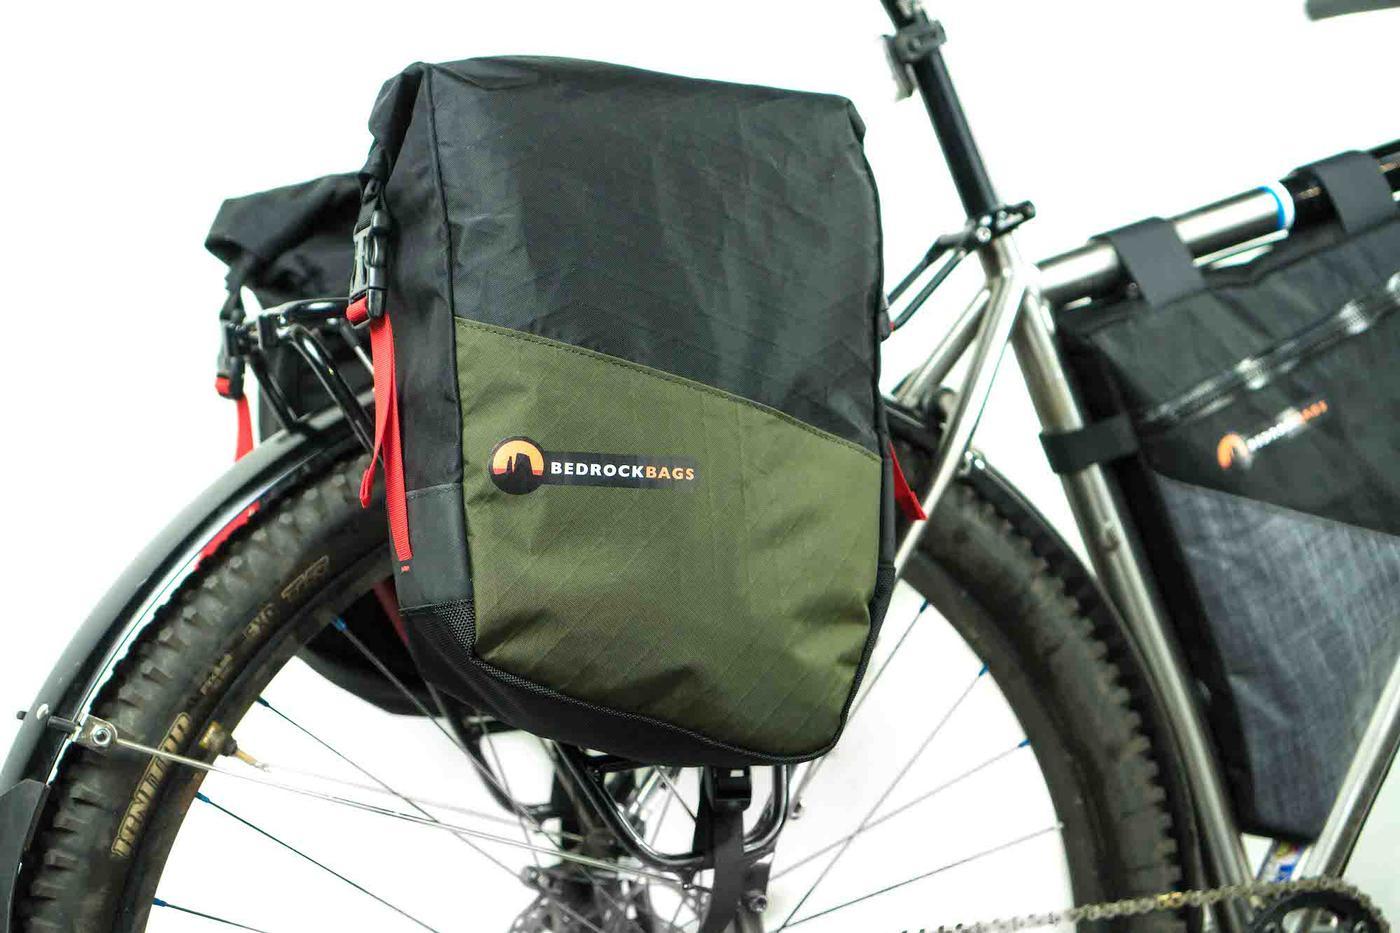 Bedrock Bag's Hermosa UL Panniers